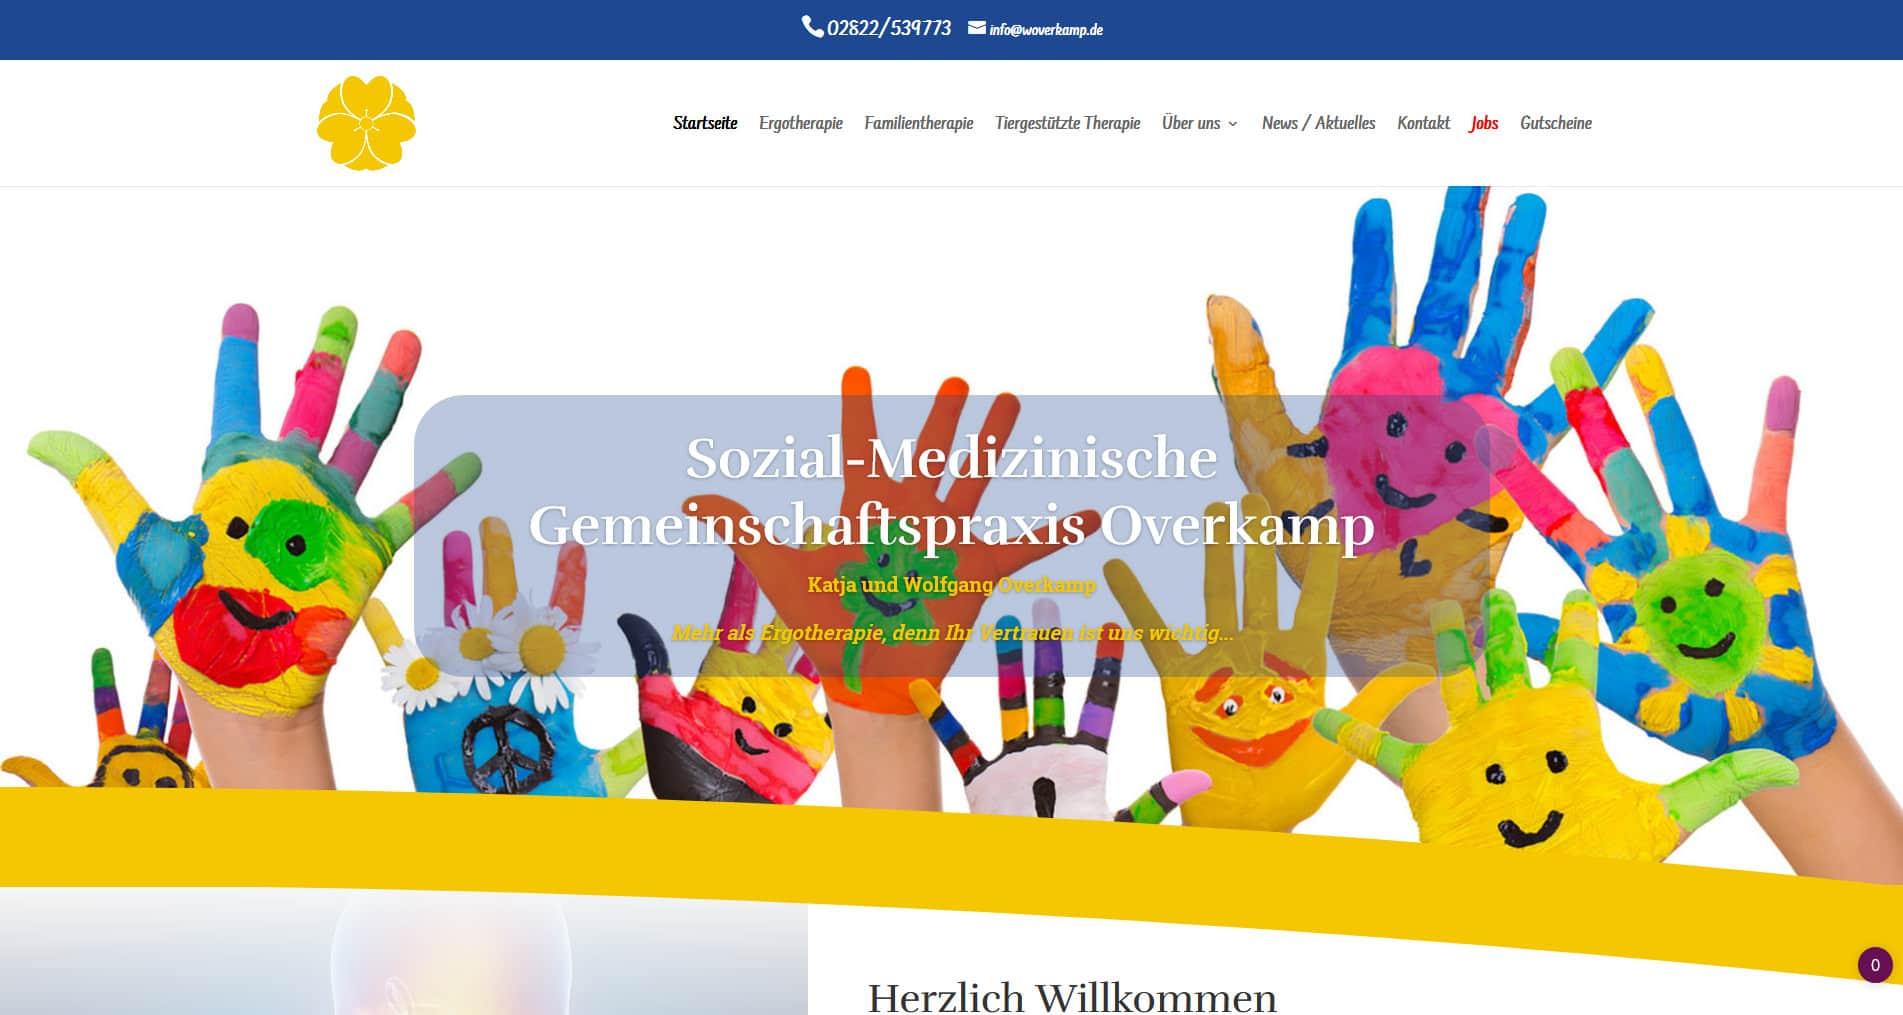 Webdesign Kleve TJWeb | Ergotherapie Praxis in Emmerich Gemeinschaftspraxis Overkamp